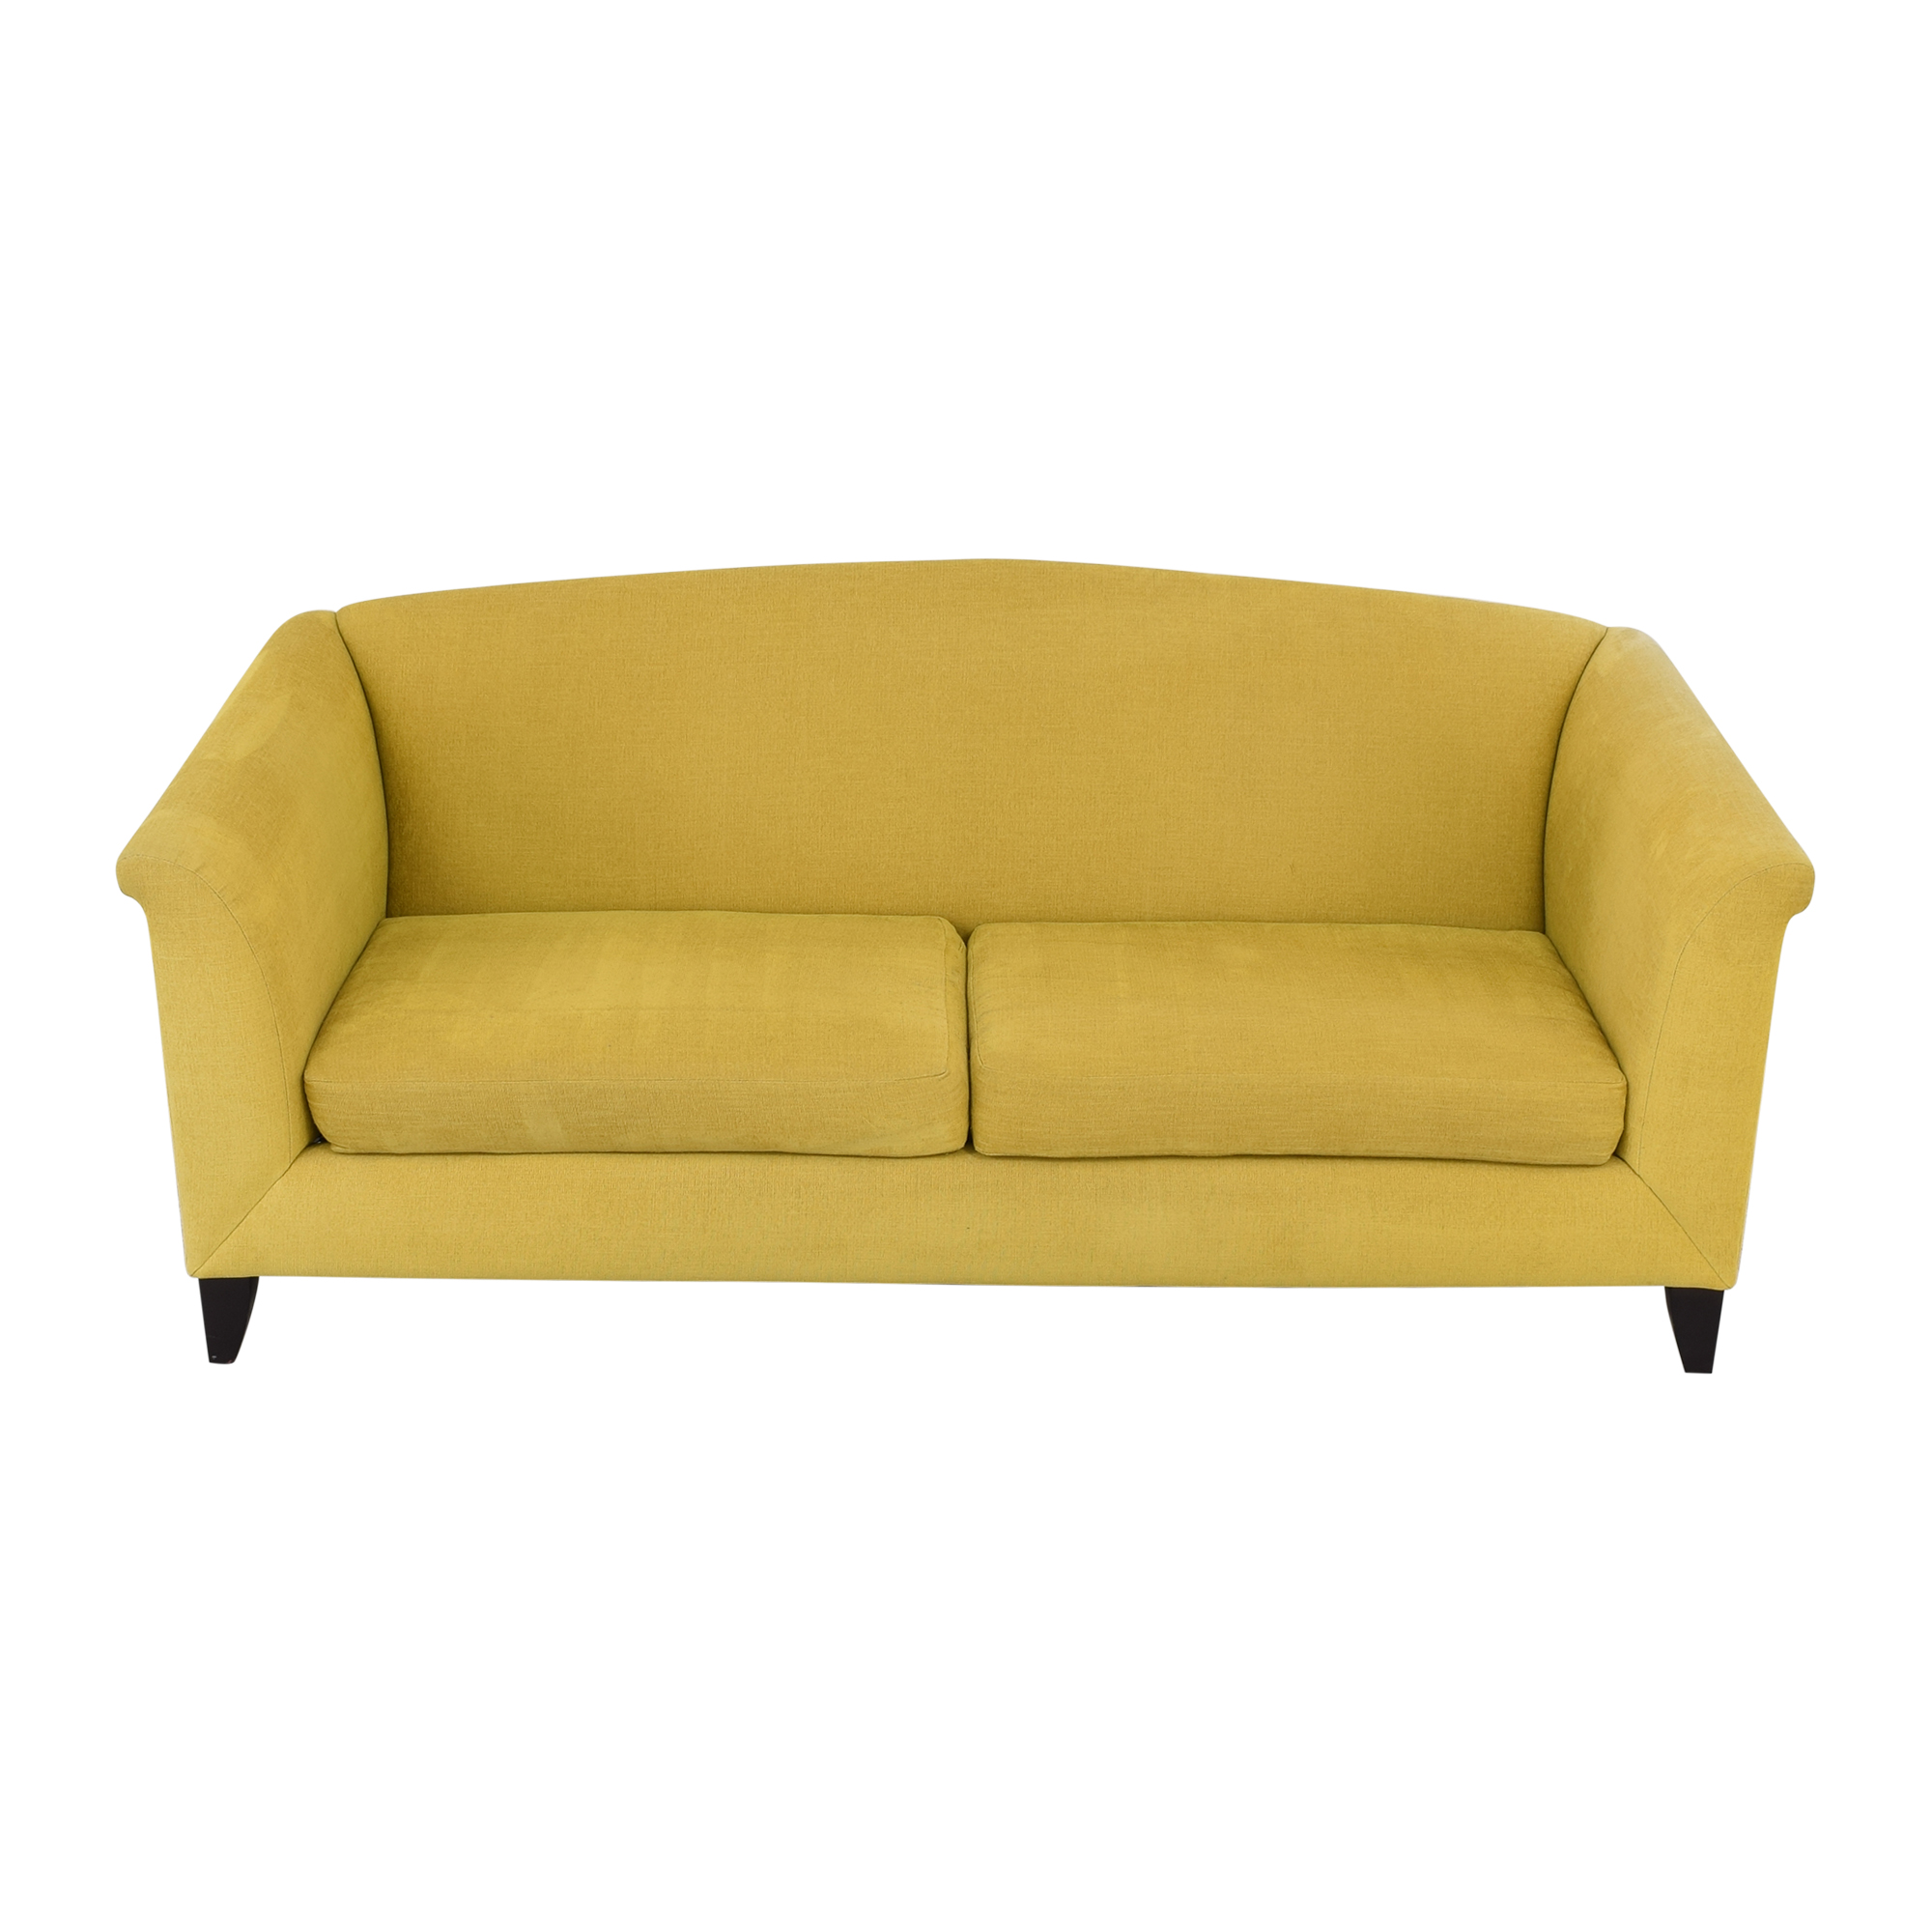 Crate & Barrel Silhouette Sofa / Sofas